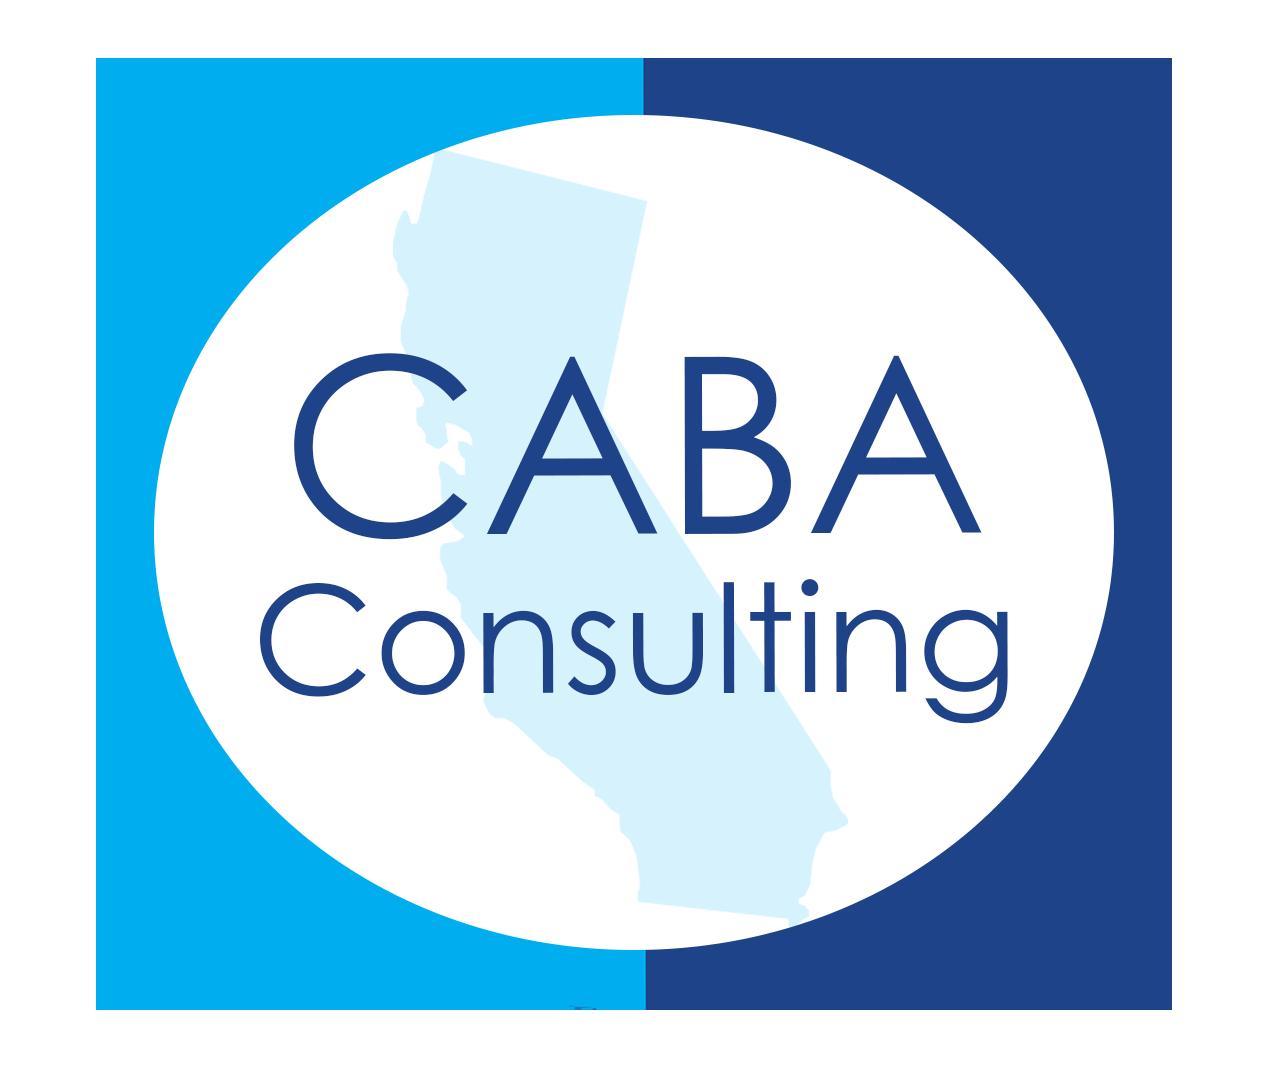 caba consulting (1)